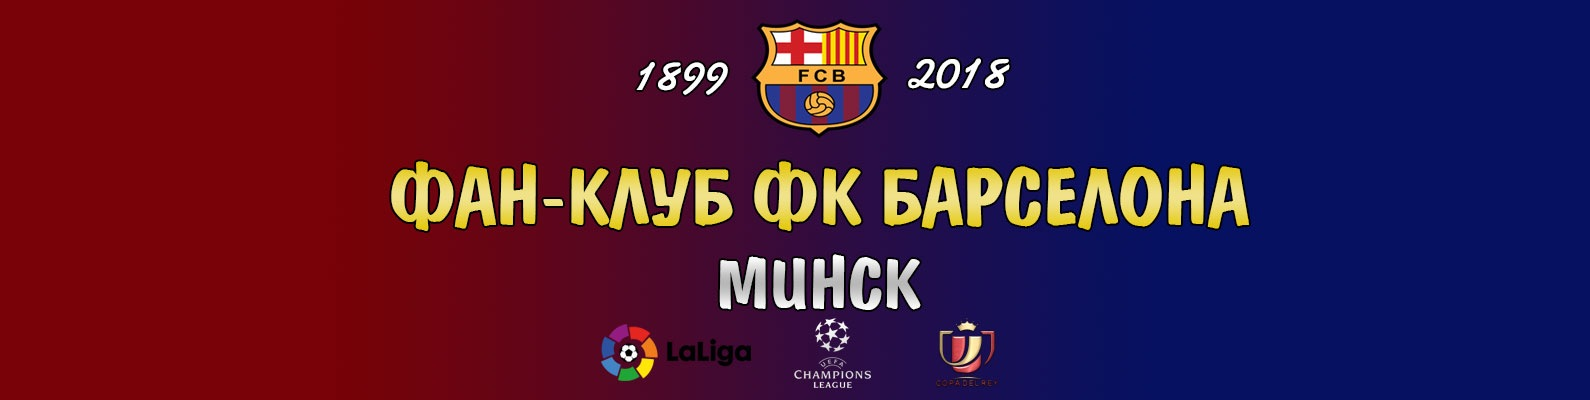 Барселона фан клуб в контакте